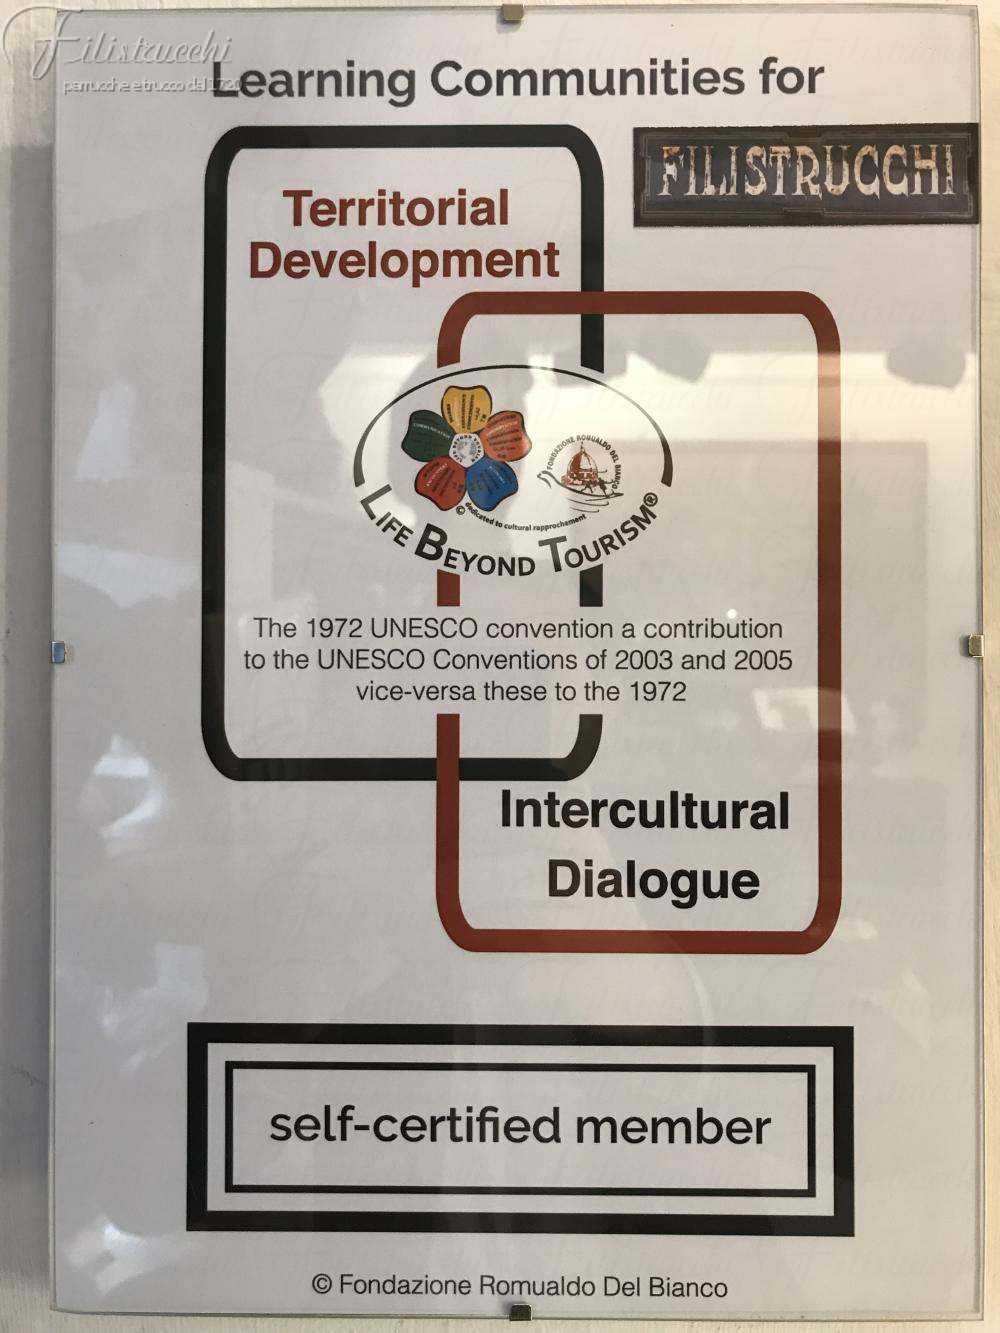 La certificazione Filistrucchi di Life Beyon Tourism